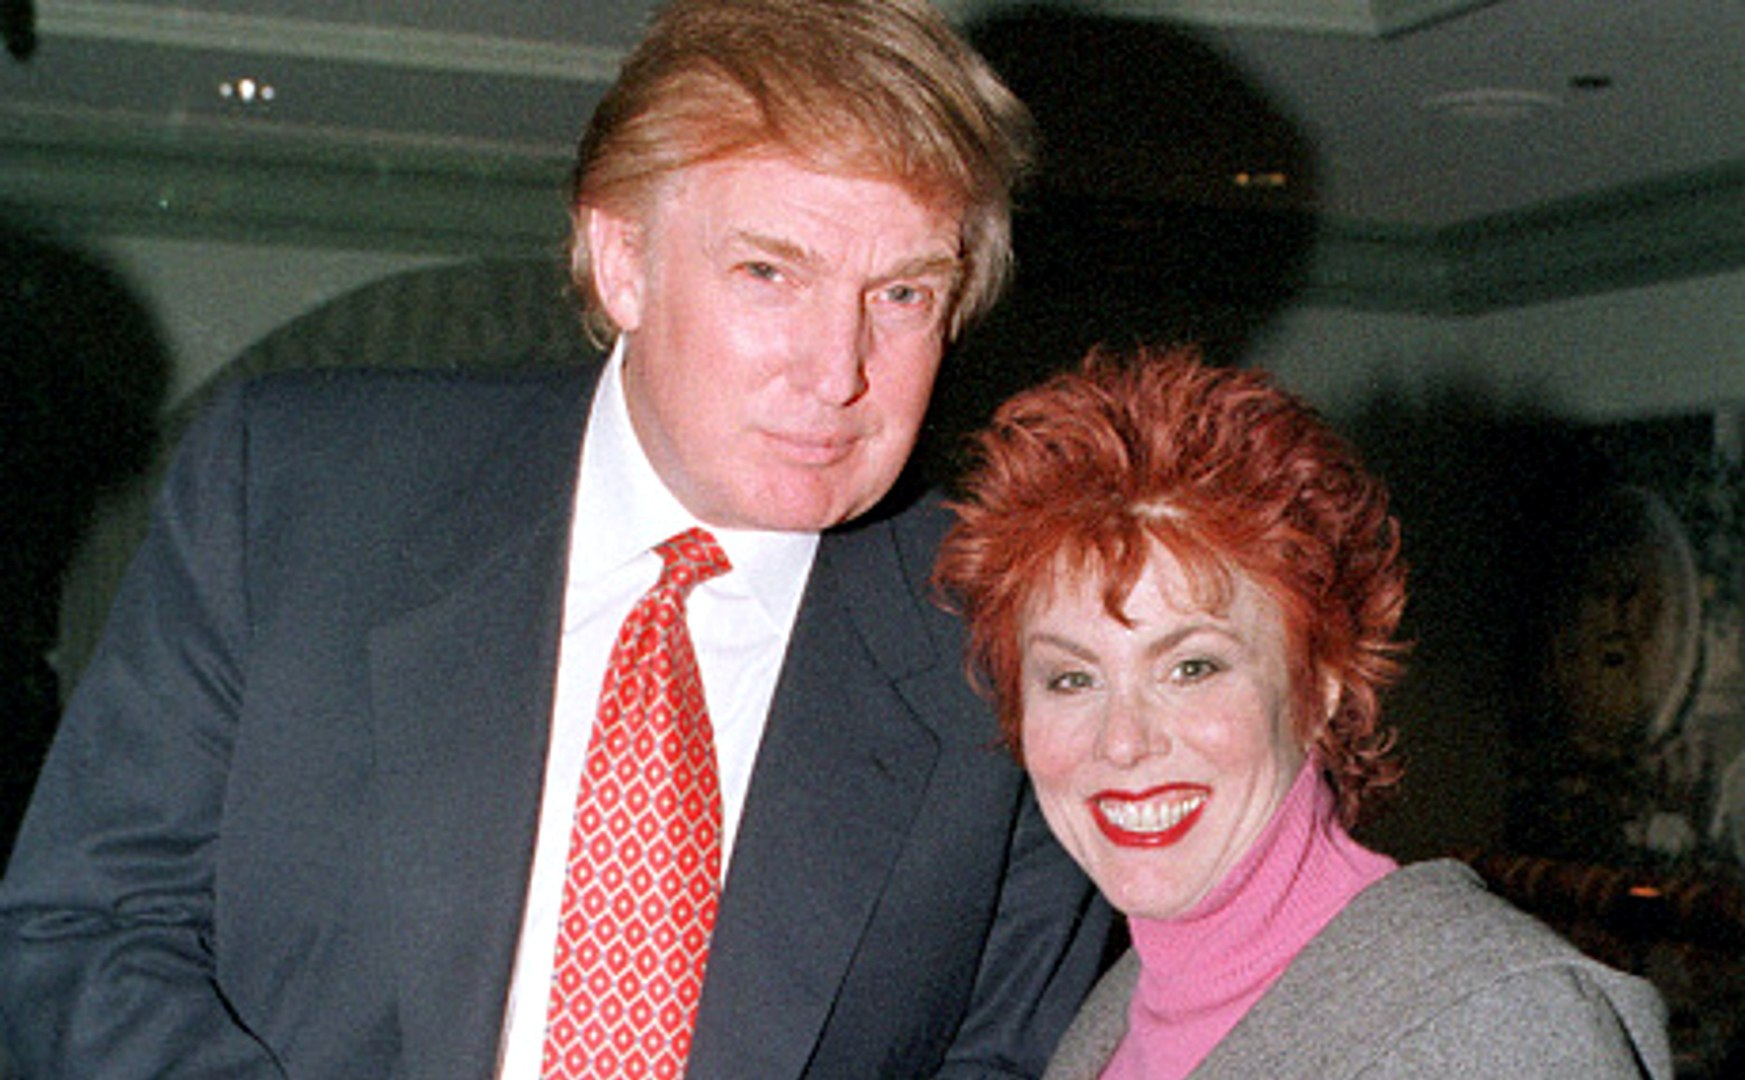 RUBY'AMERICAN PIE - Donald Trump